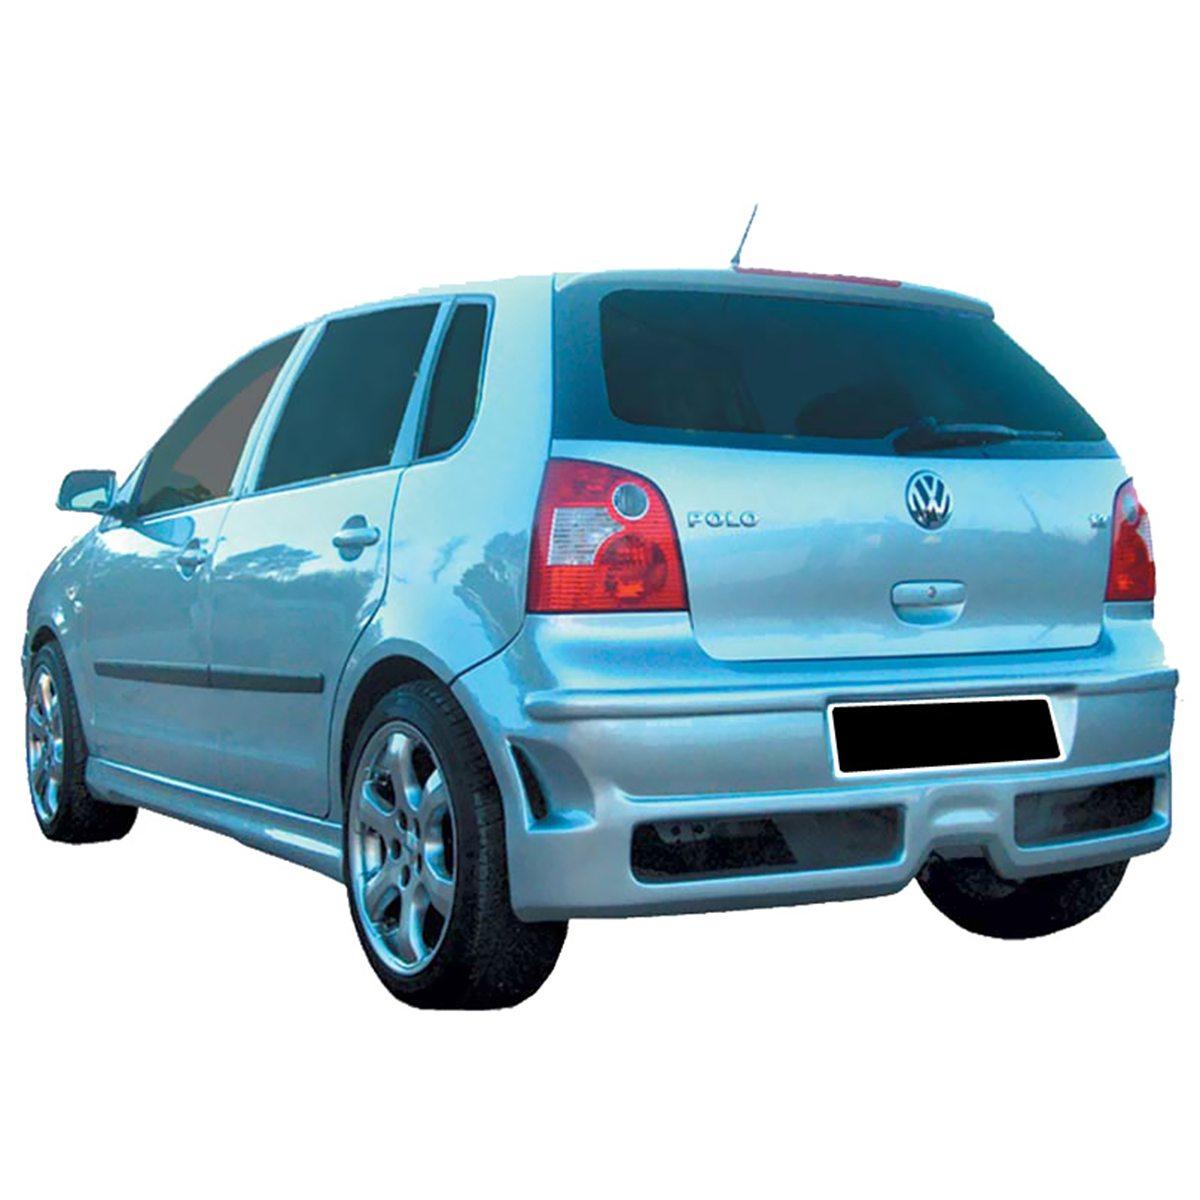 VW-Polo-VI-Cool-Tras-PCA151